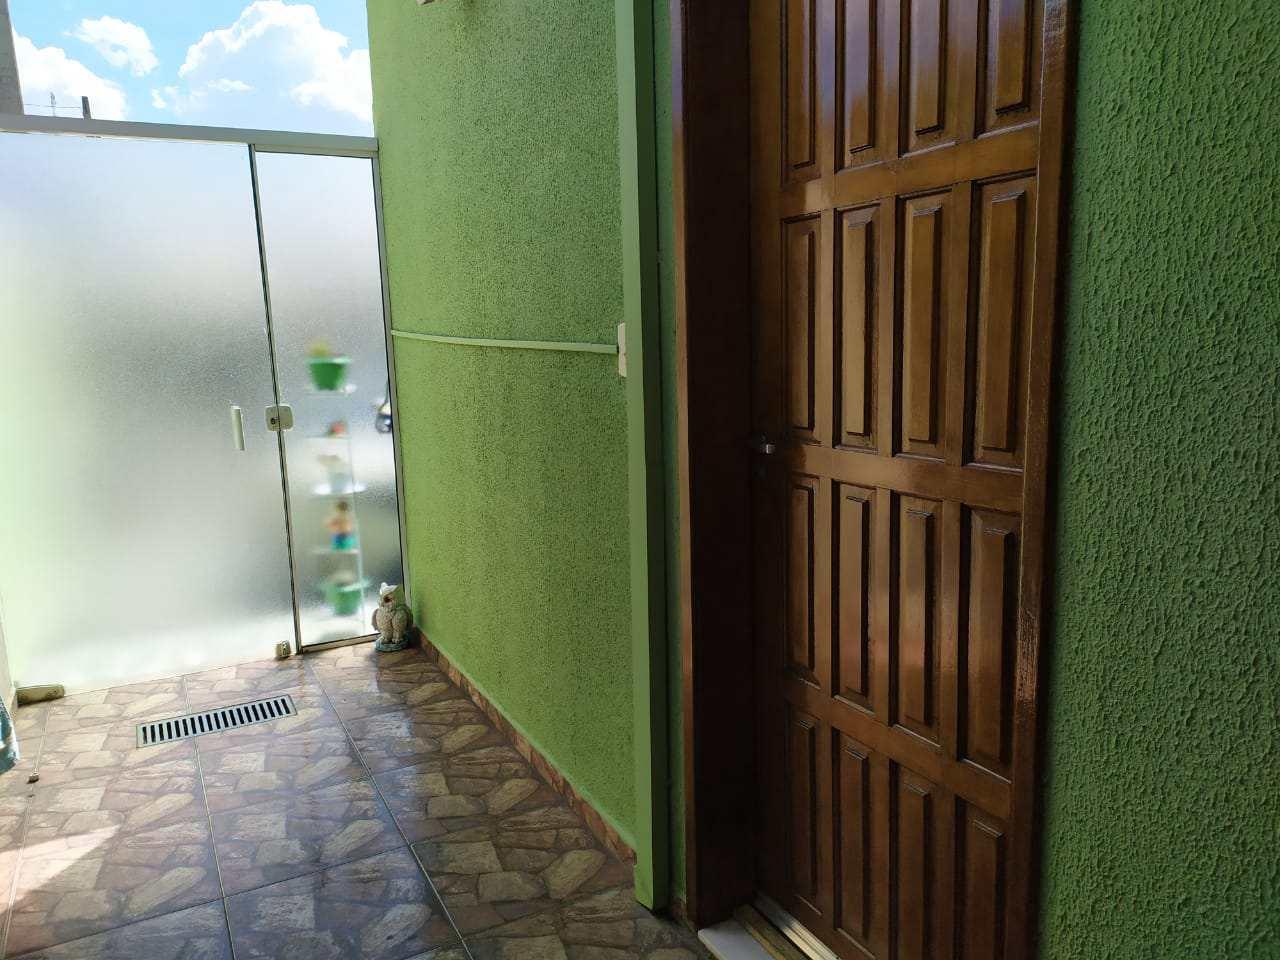 Casa de Condomínio com 3 dorms, Itapema, Guararema - R$ 440 mil, Cod: 4077